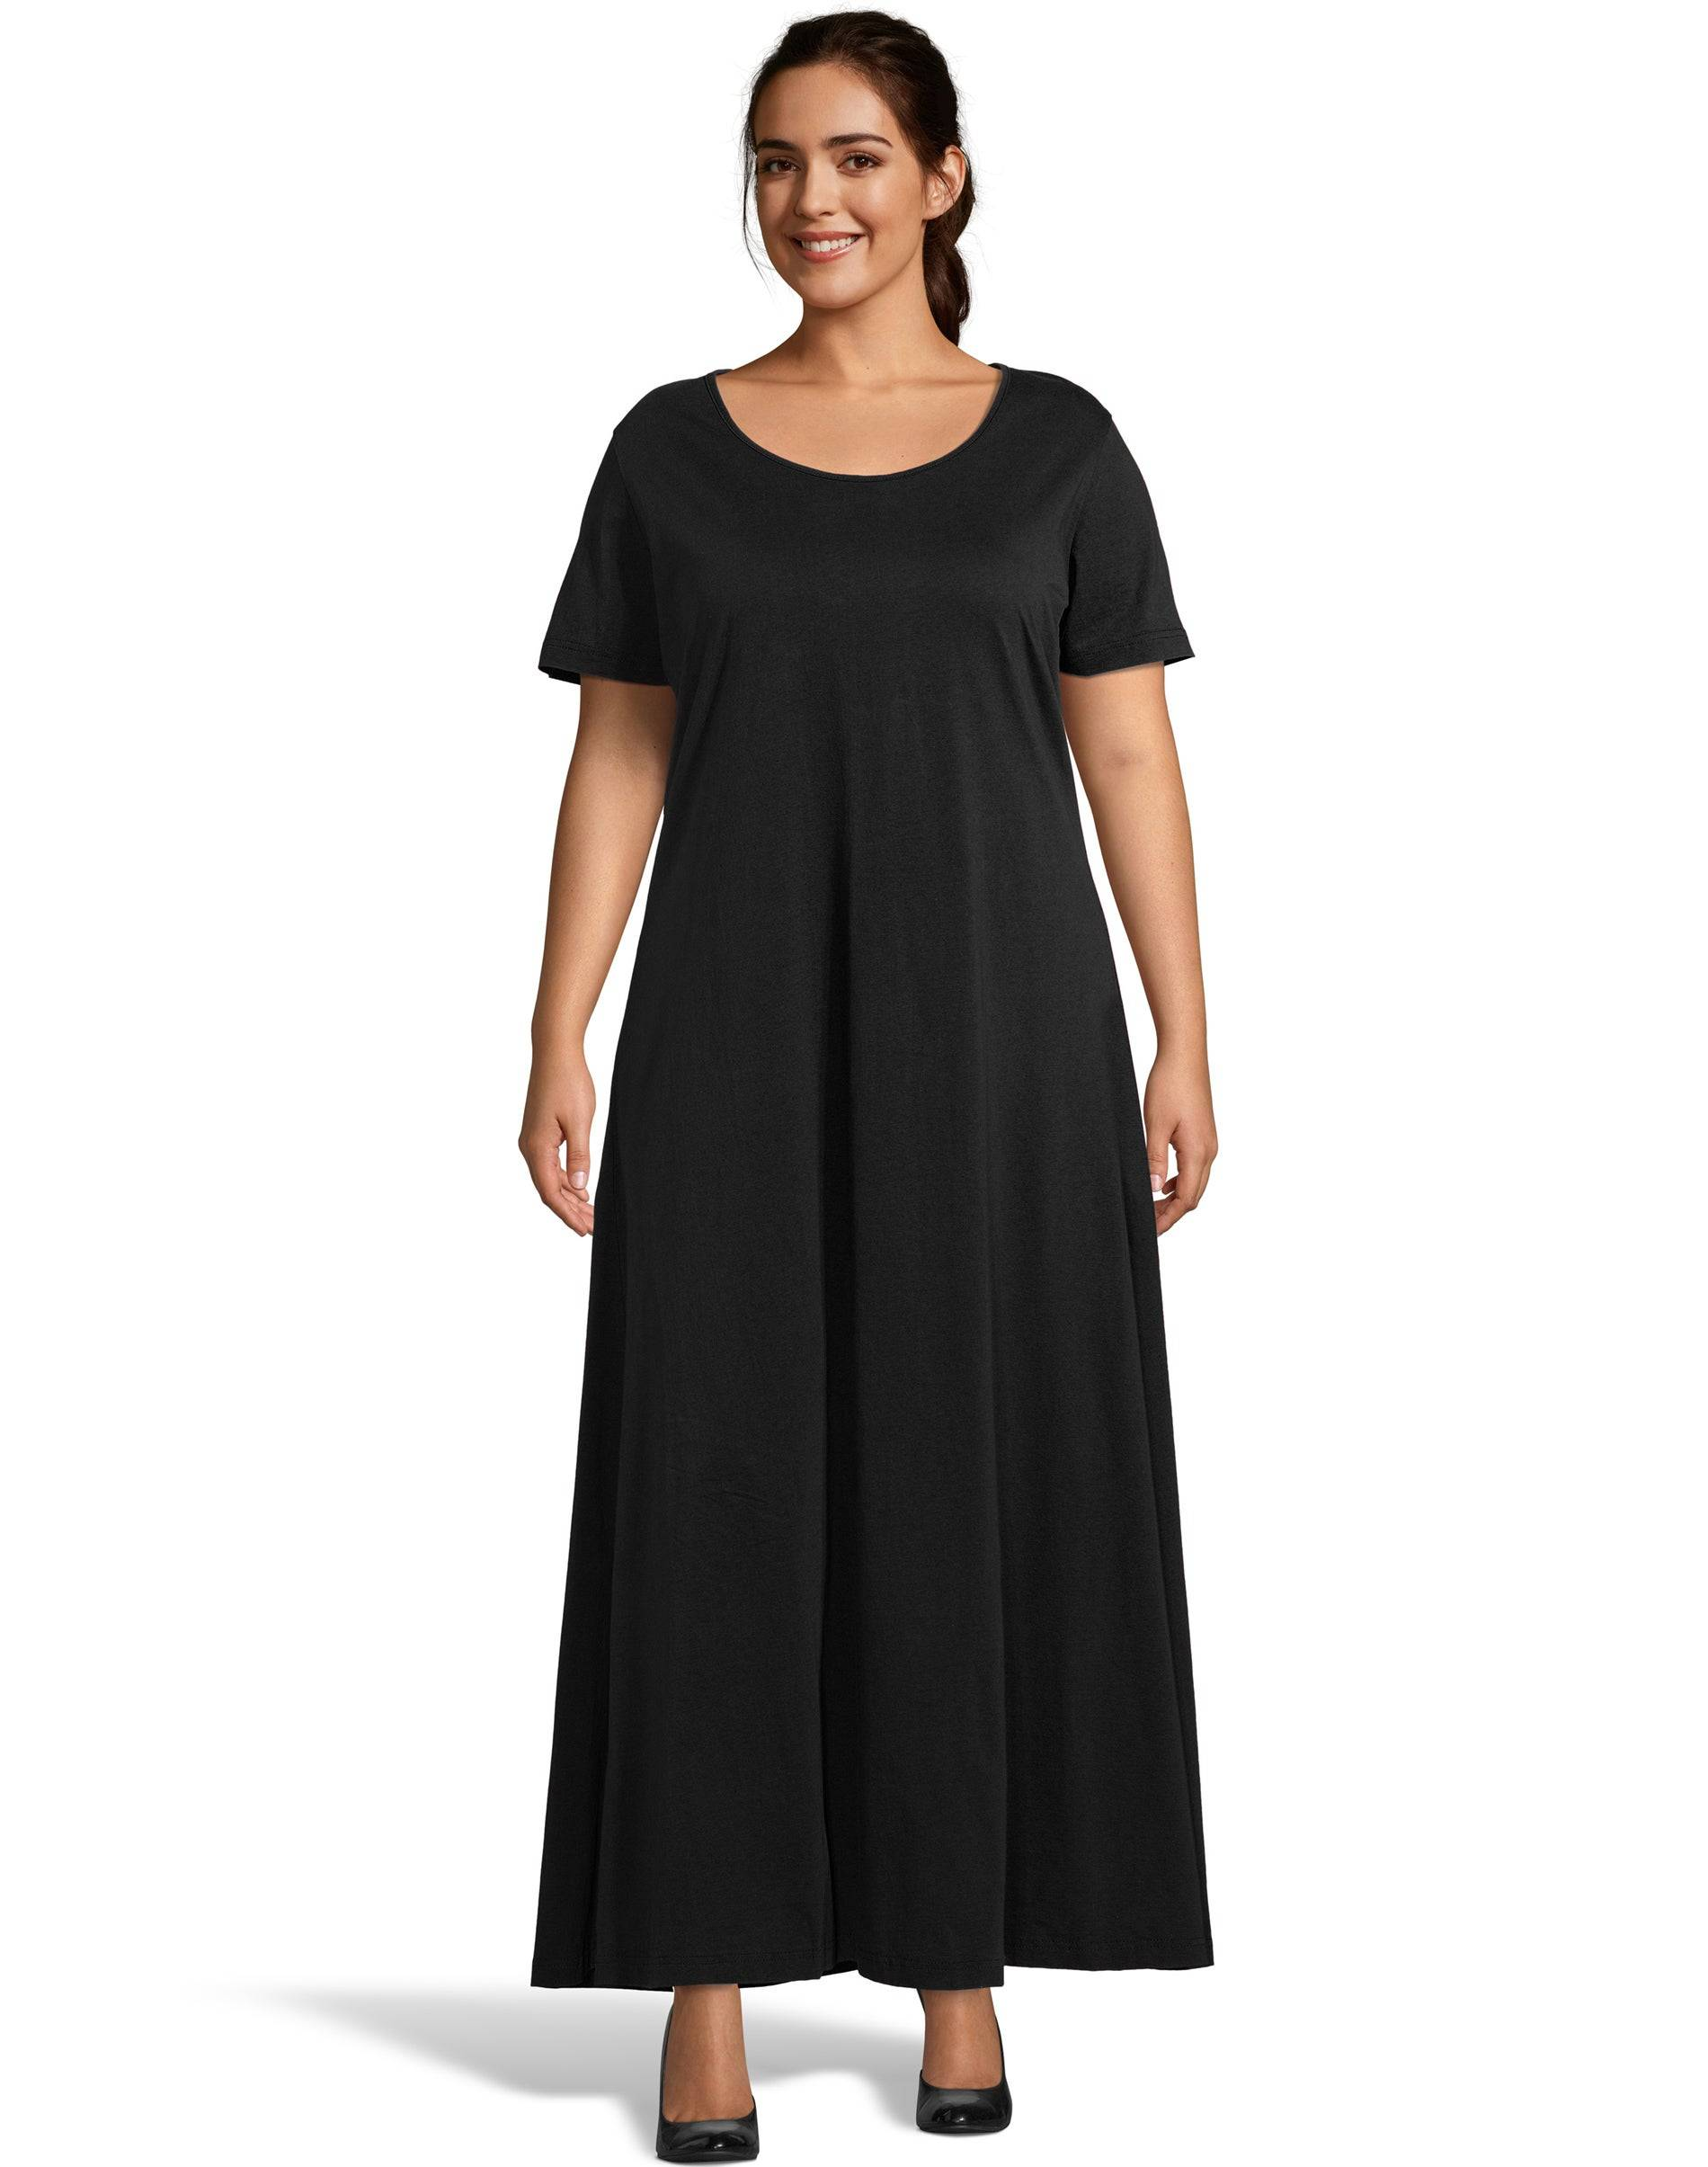 Just My Size Jersey Matchables Maxi Dress Black 2X Women's